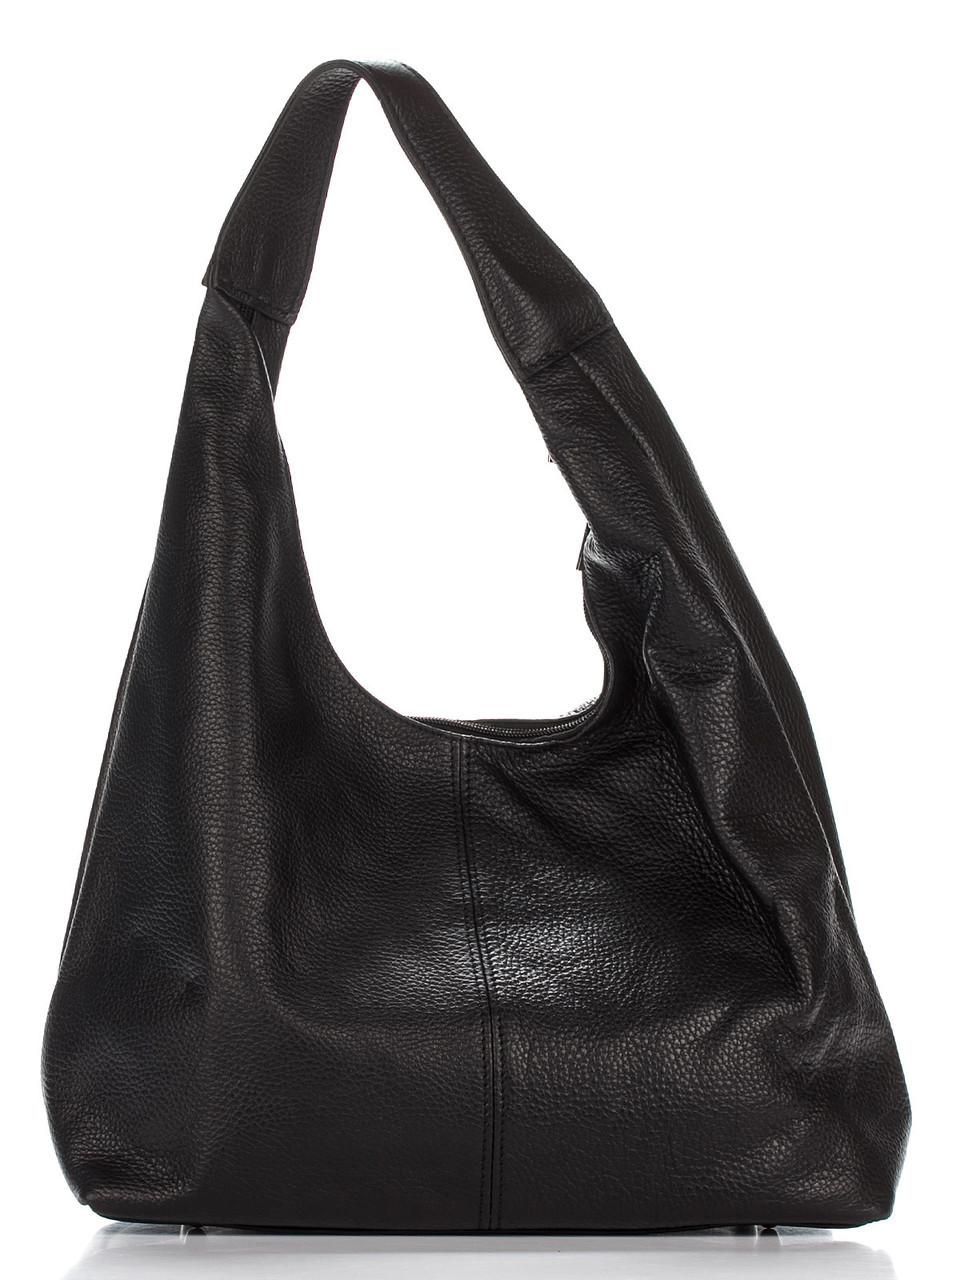 Сумка хобо SONDRA бренда Diva's Bag черного цвета 32 см х 24 см х 14 см